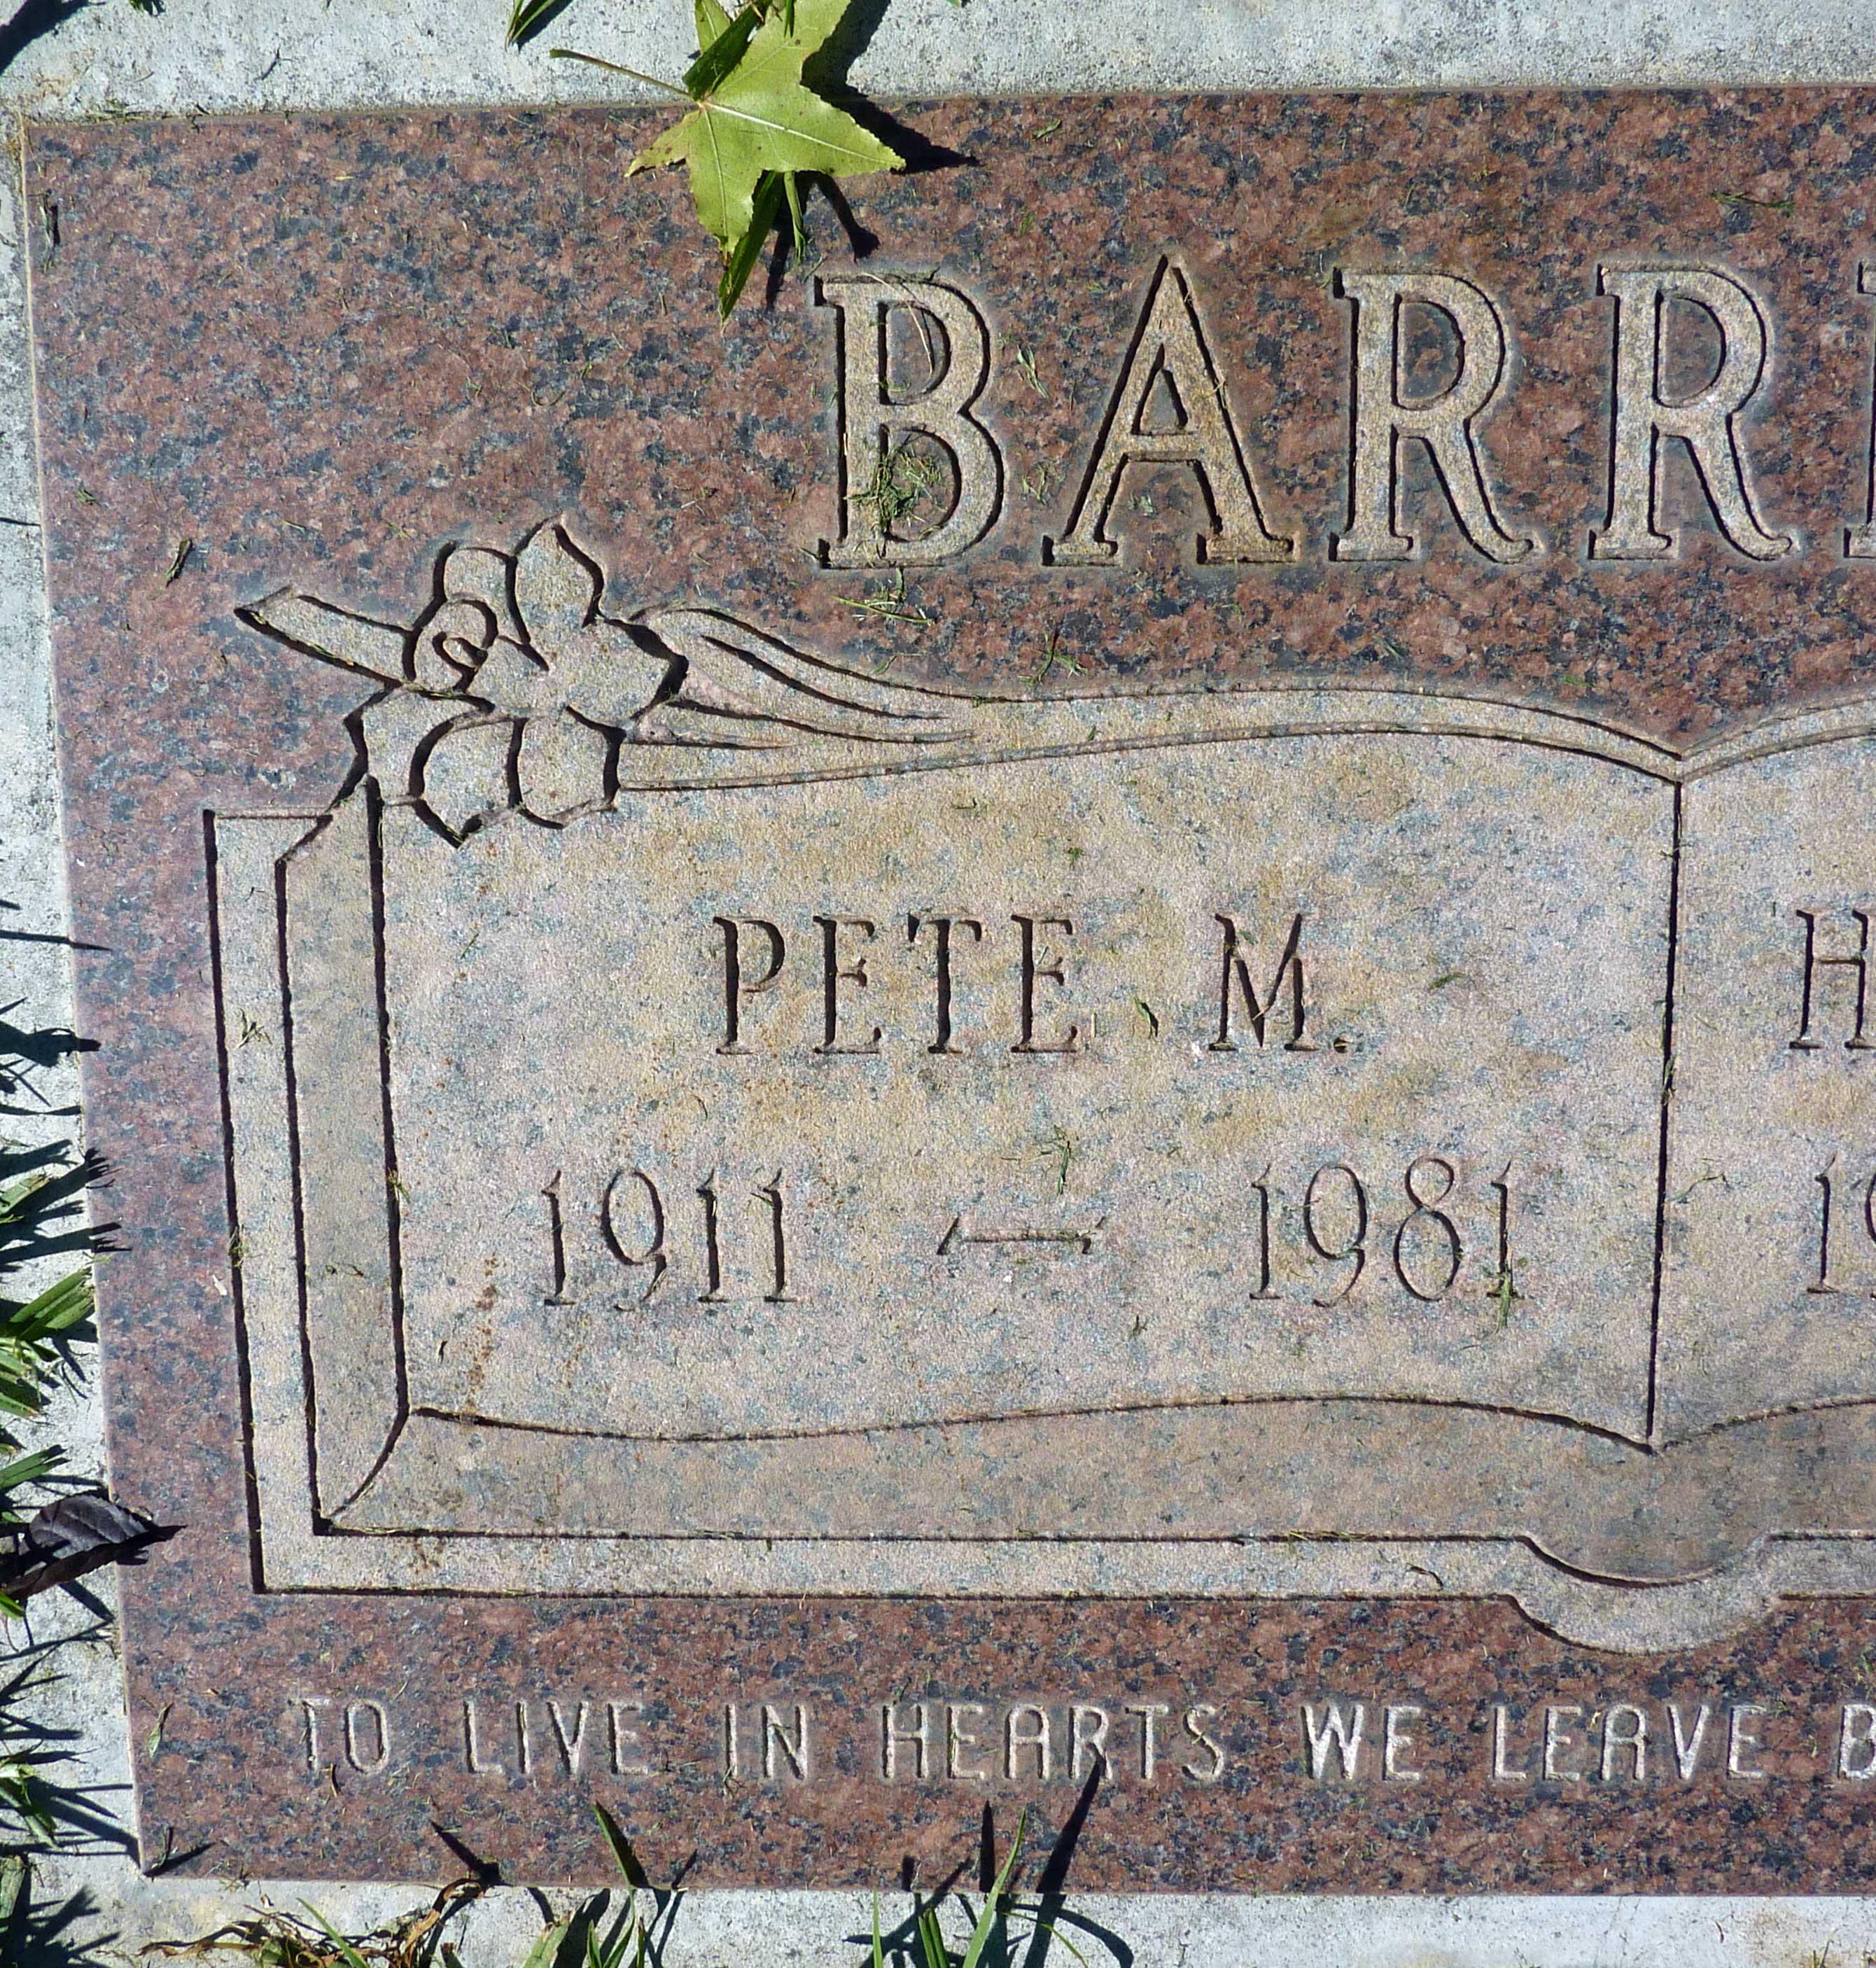 Pete Barrera